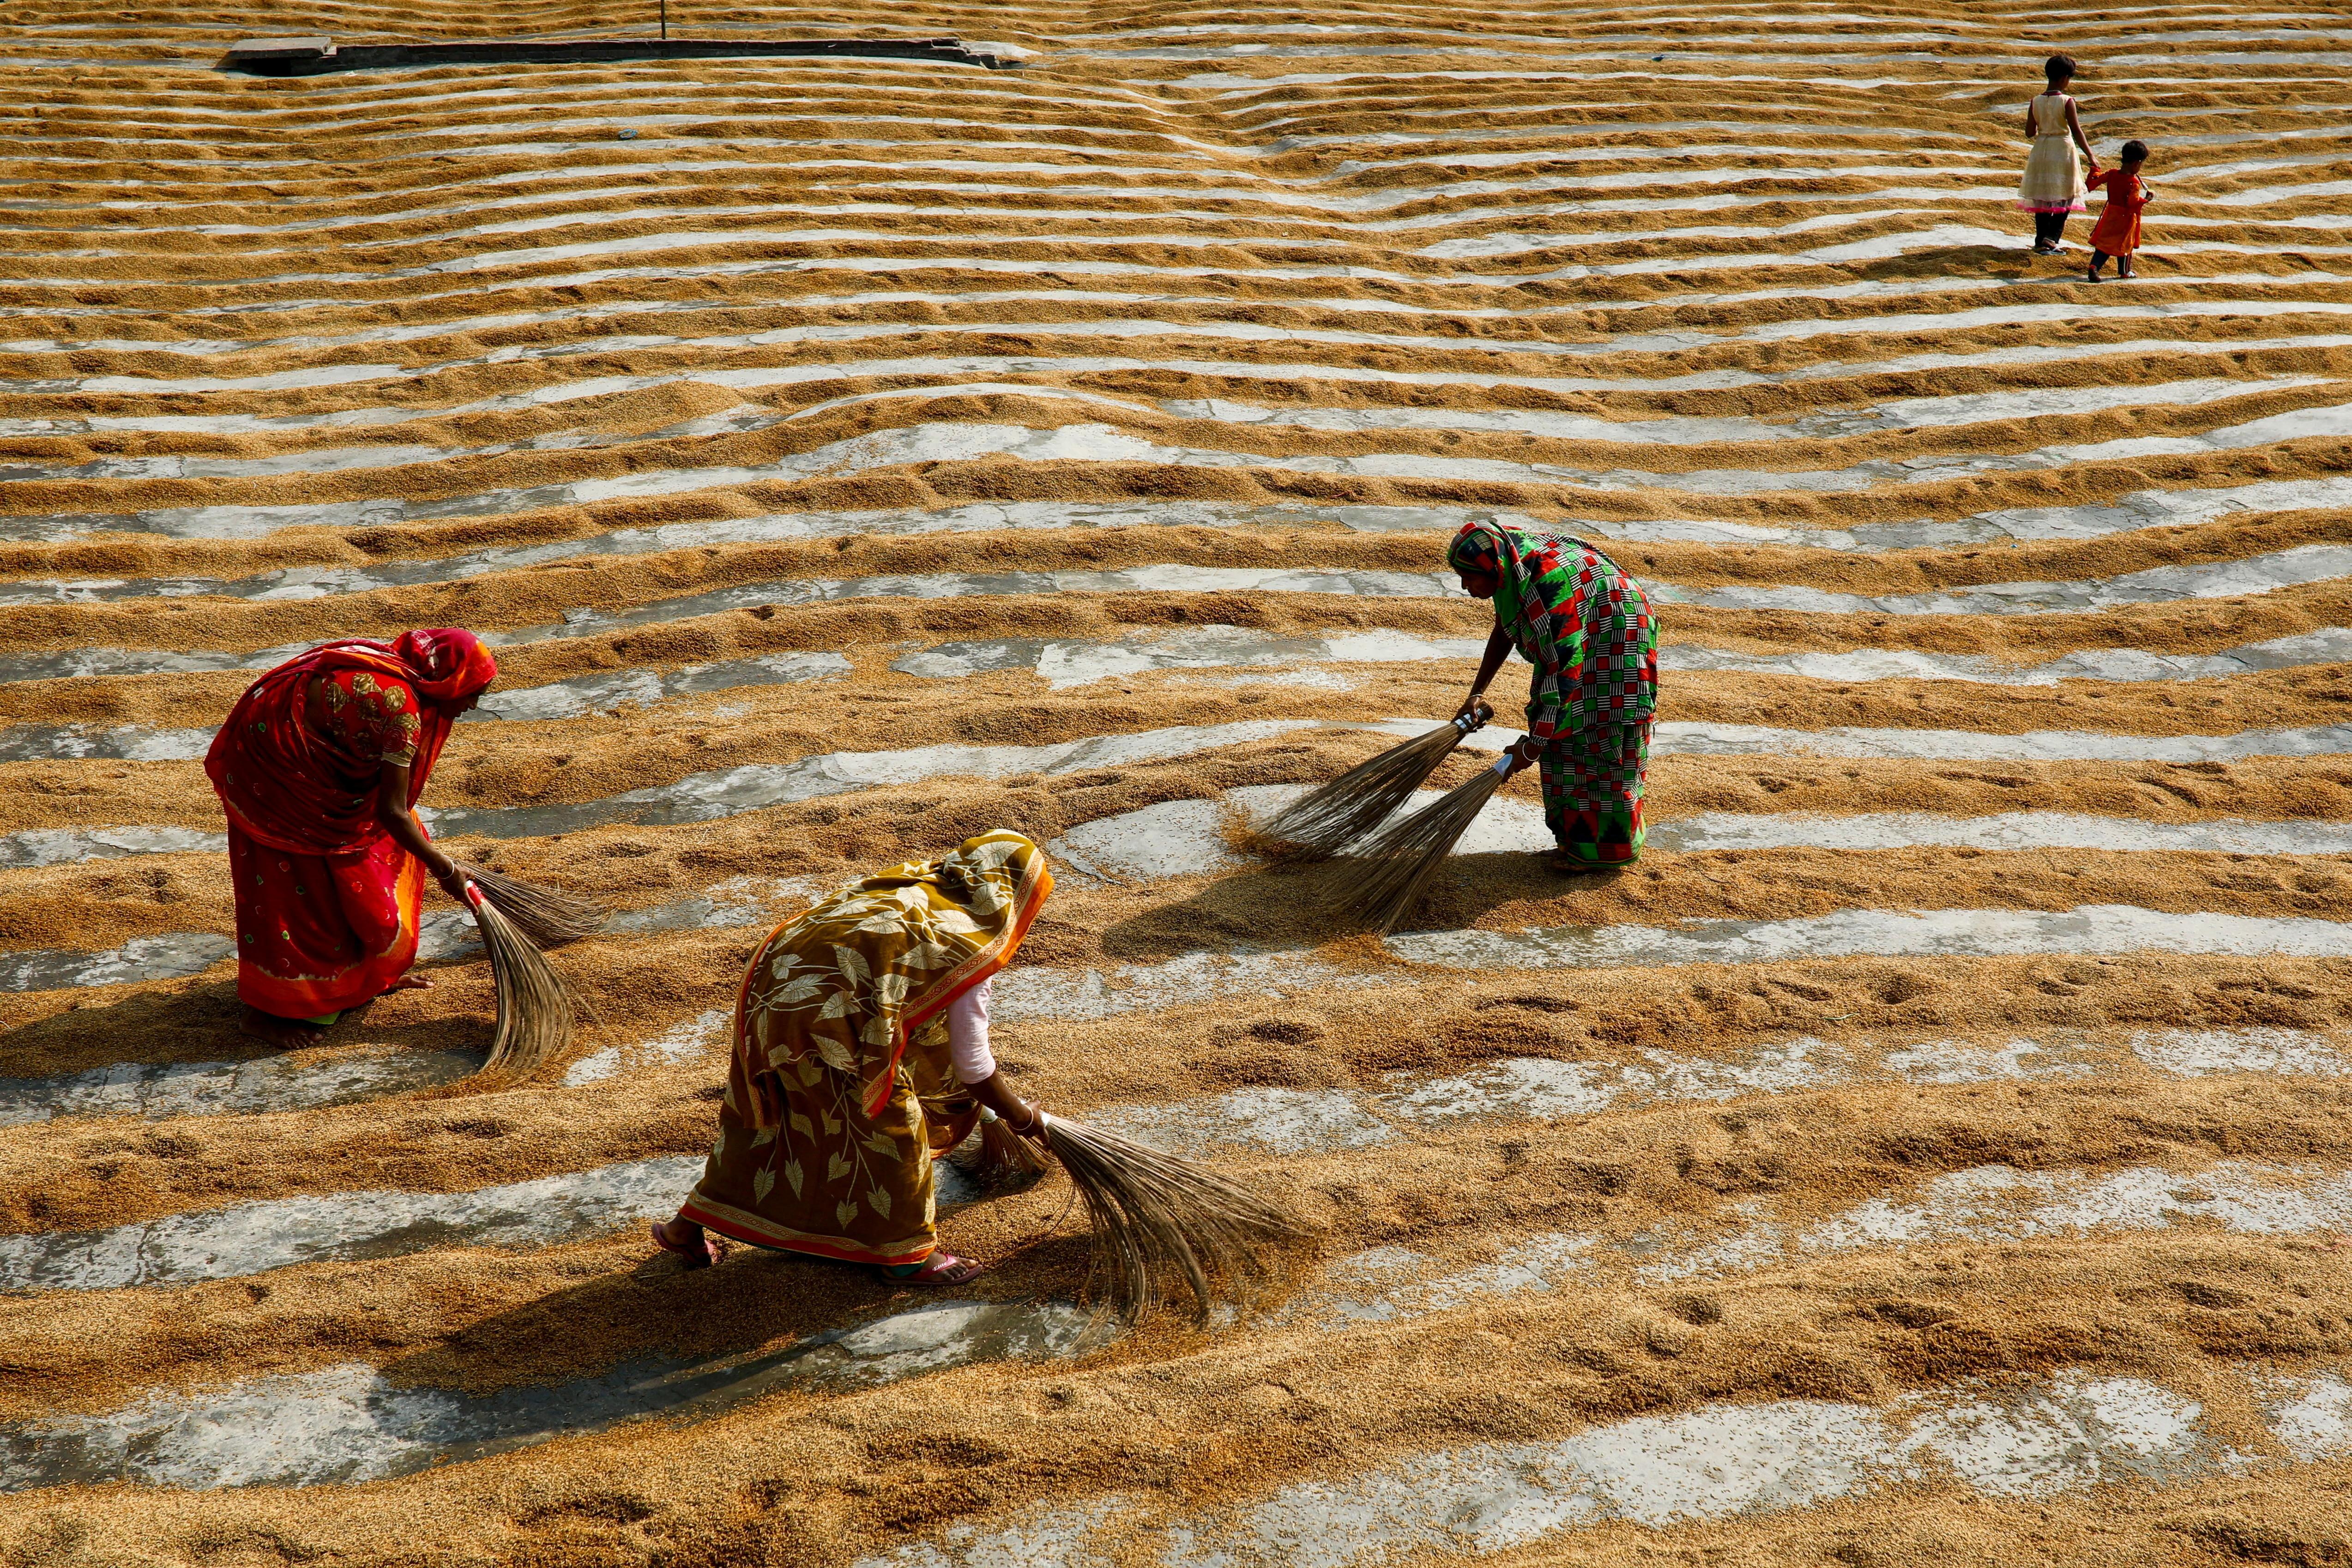 Women work in a rice processing mill in Munshiganj, Bangladesh